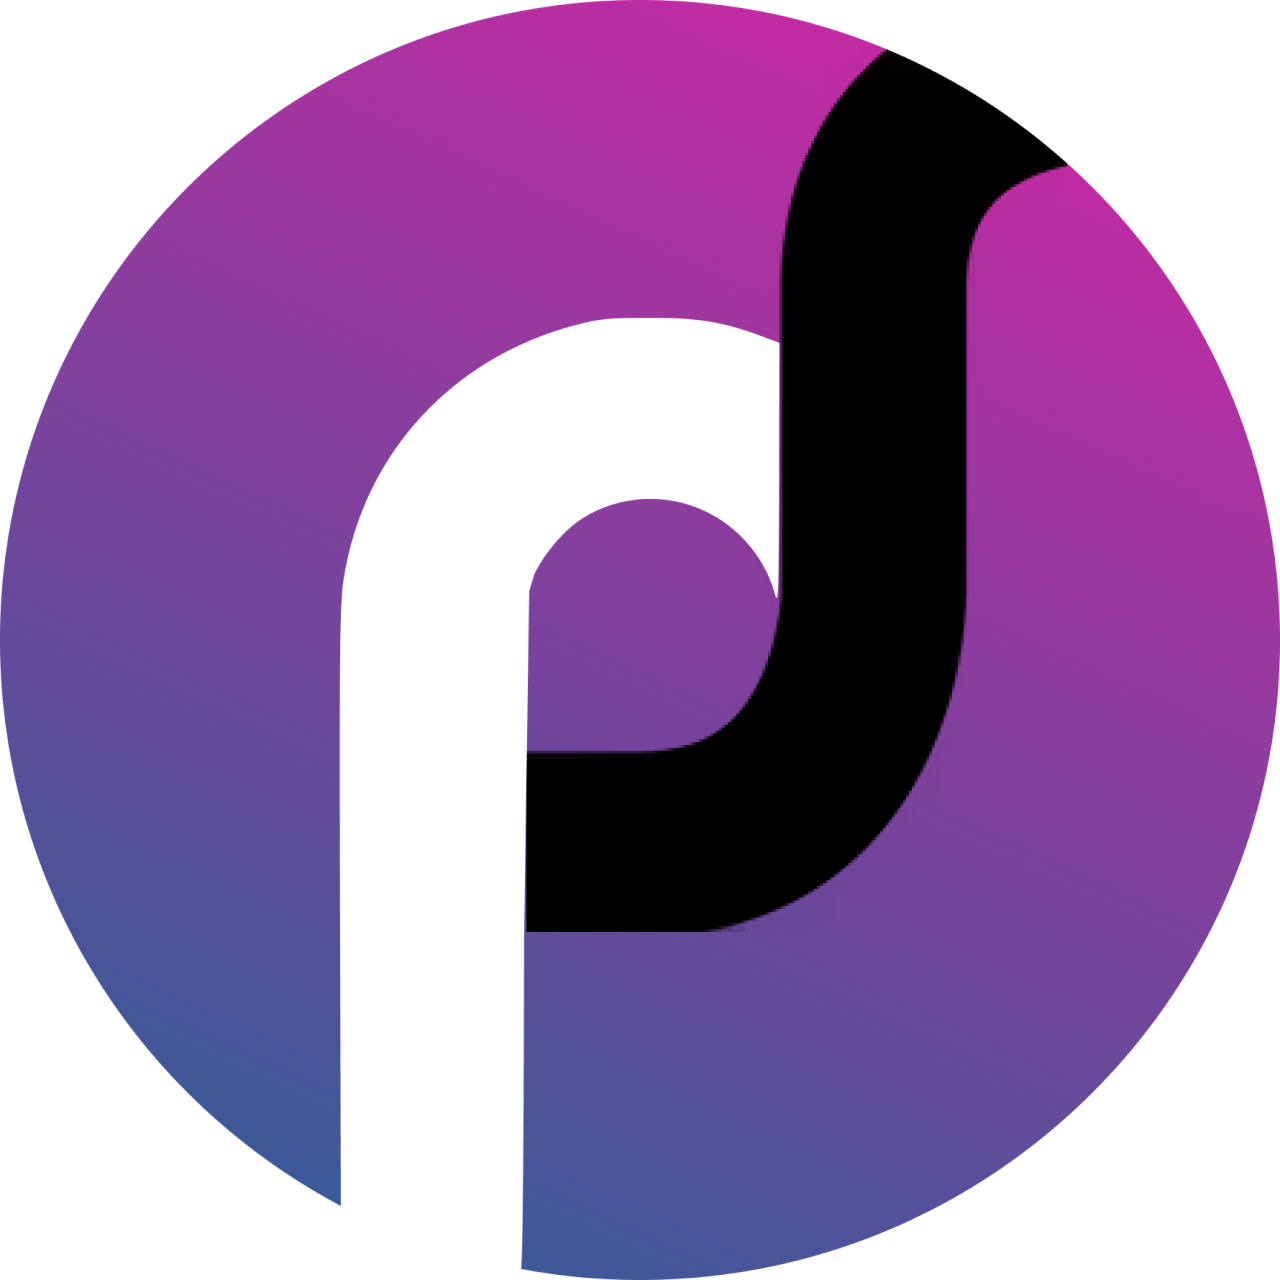 panicc softworks